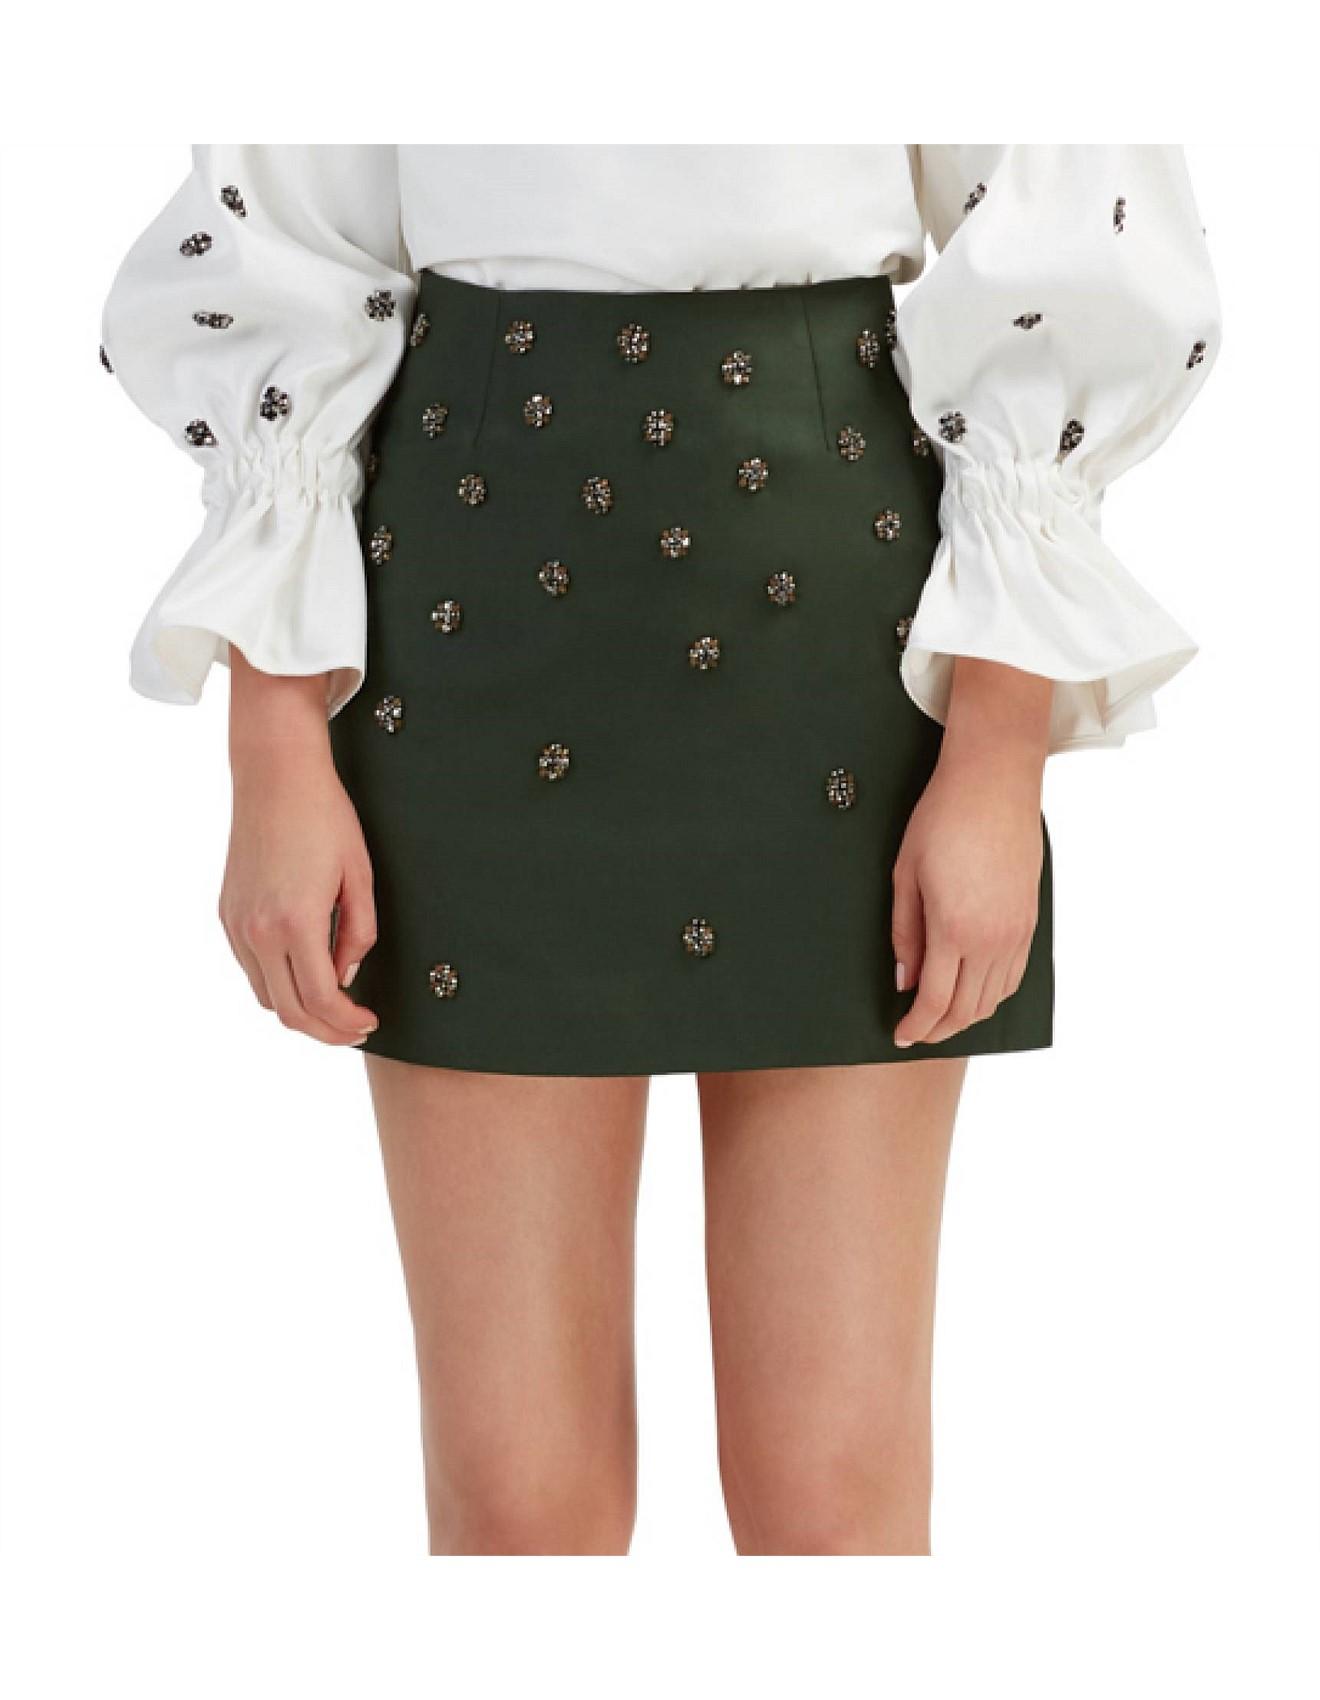 0a2f2a80890990 Assemble Mini Skirt